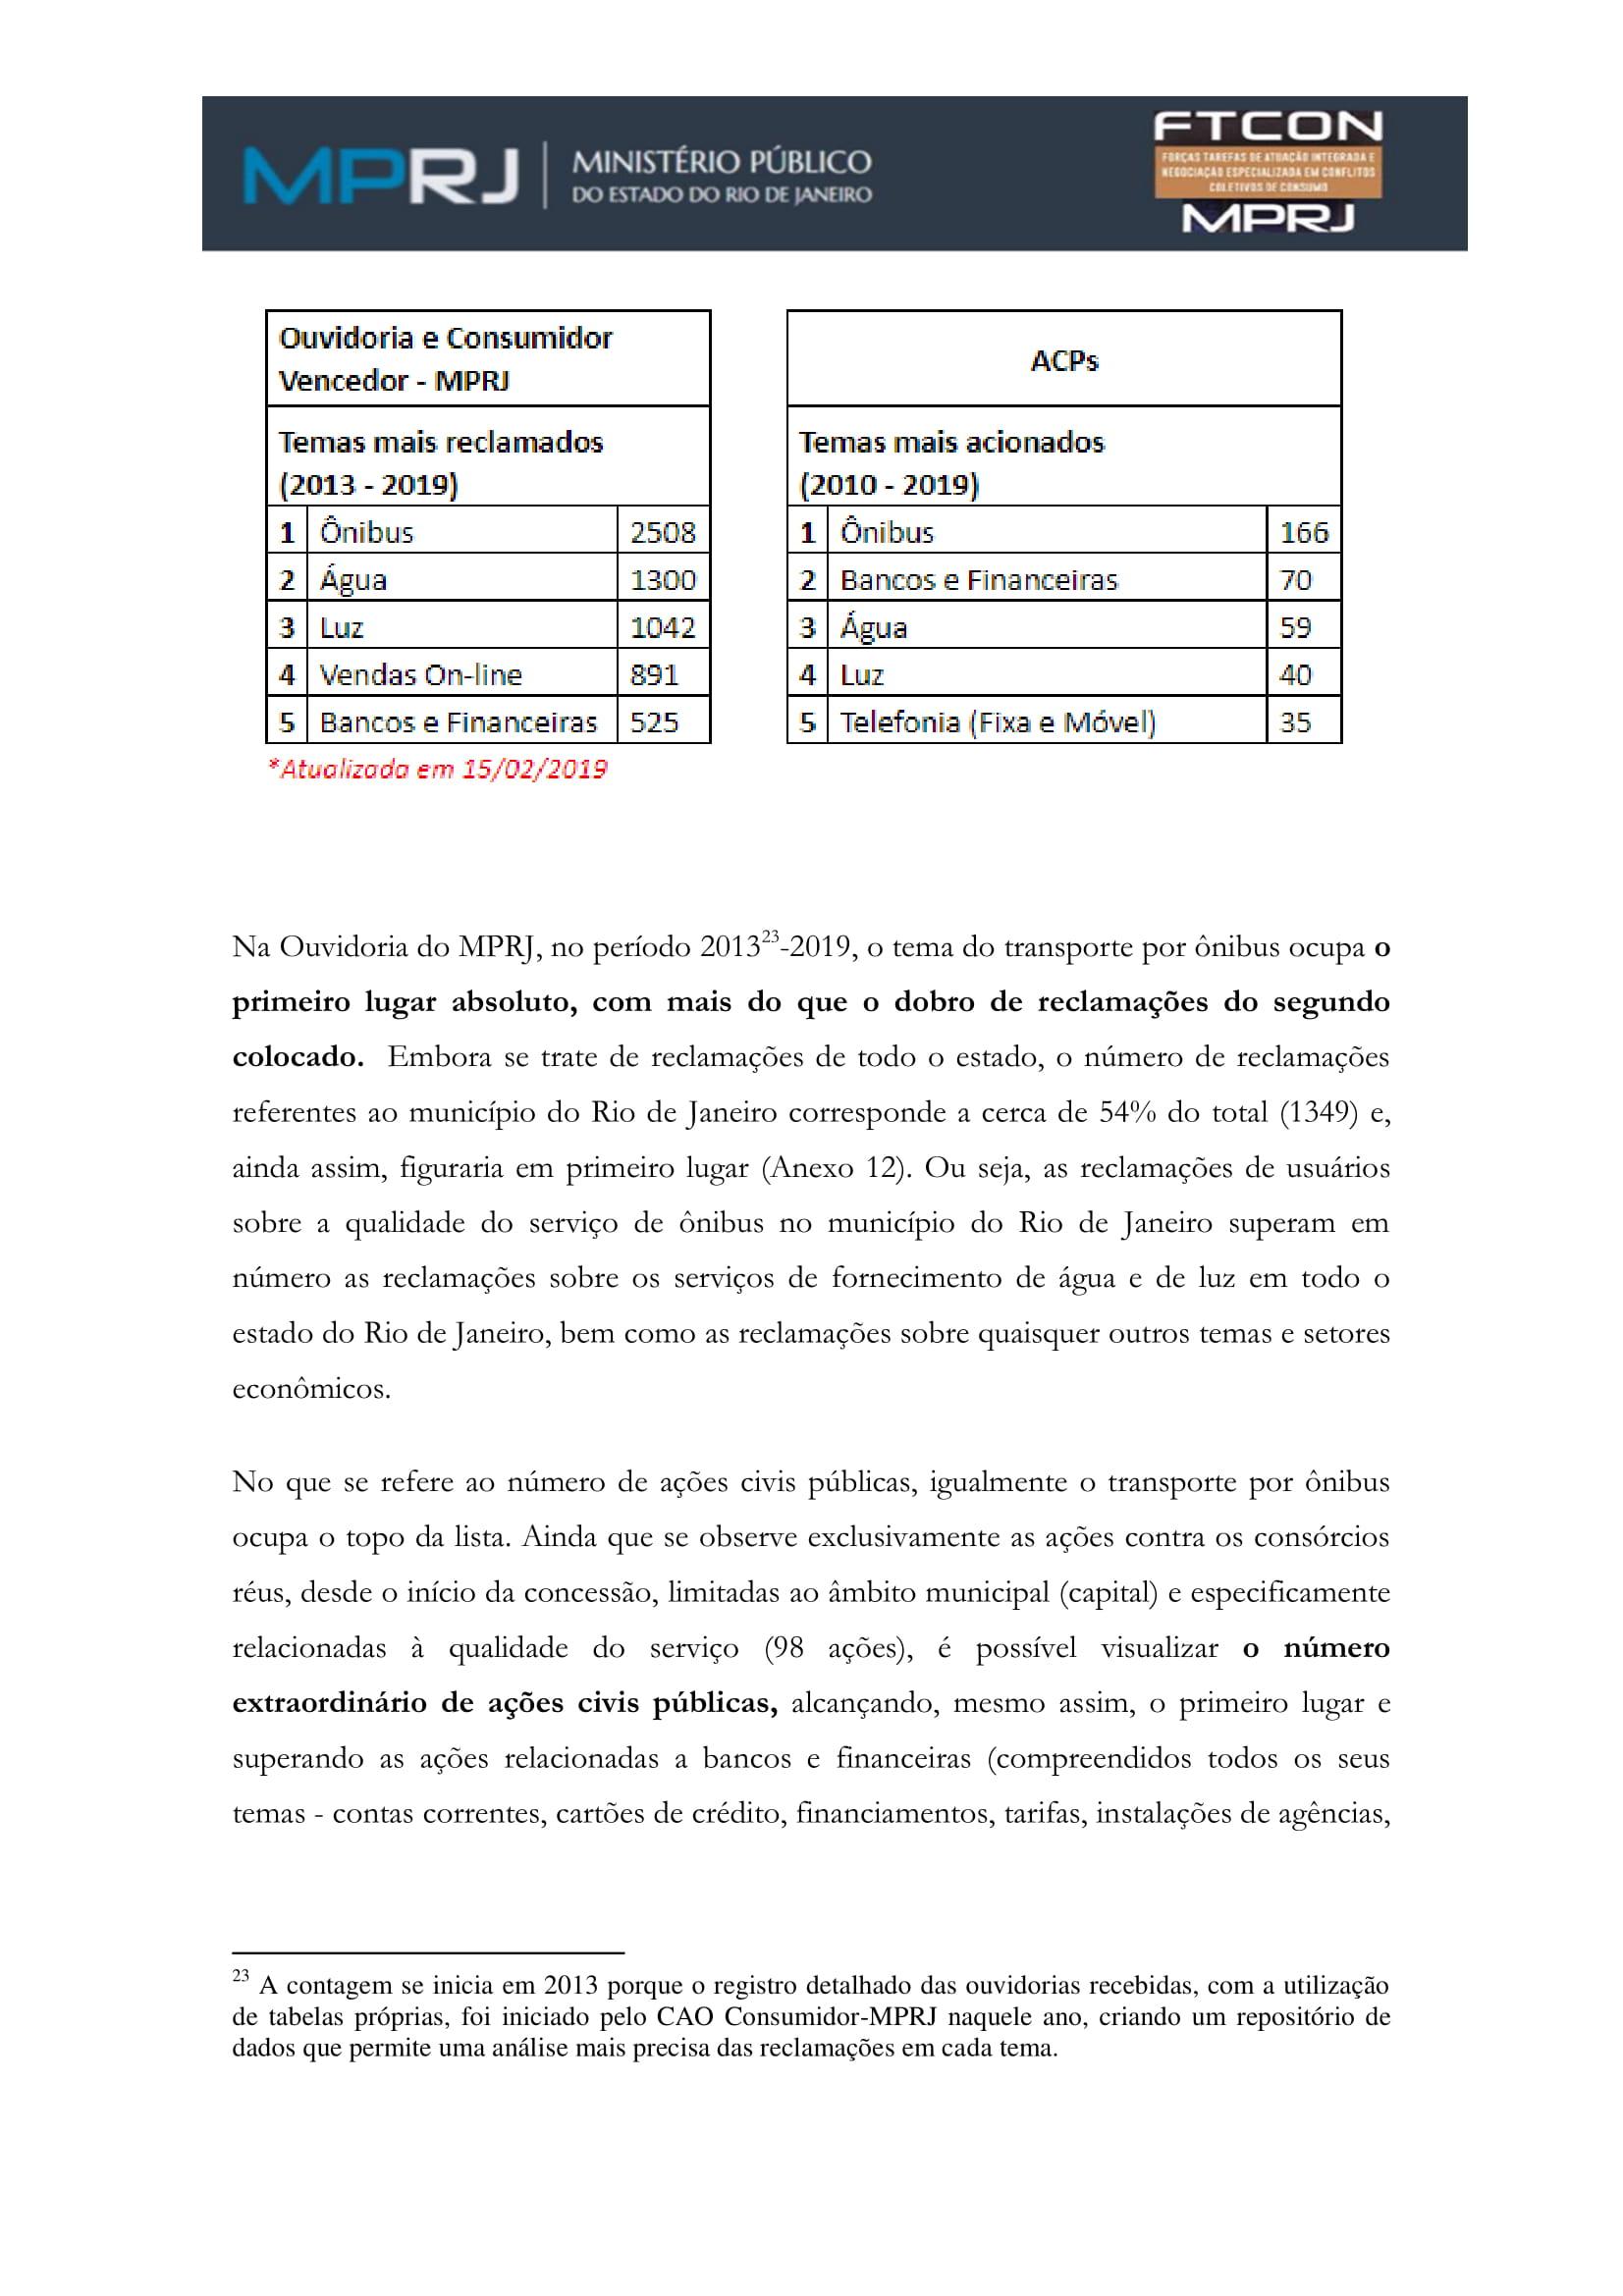 acp_caducidade_onibus_dr_rt-023